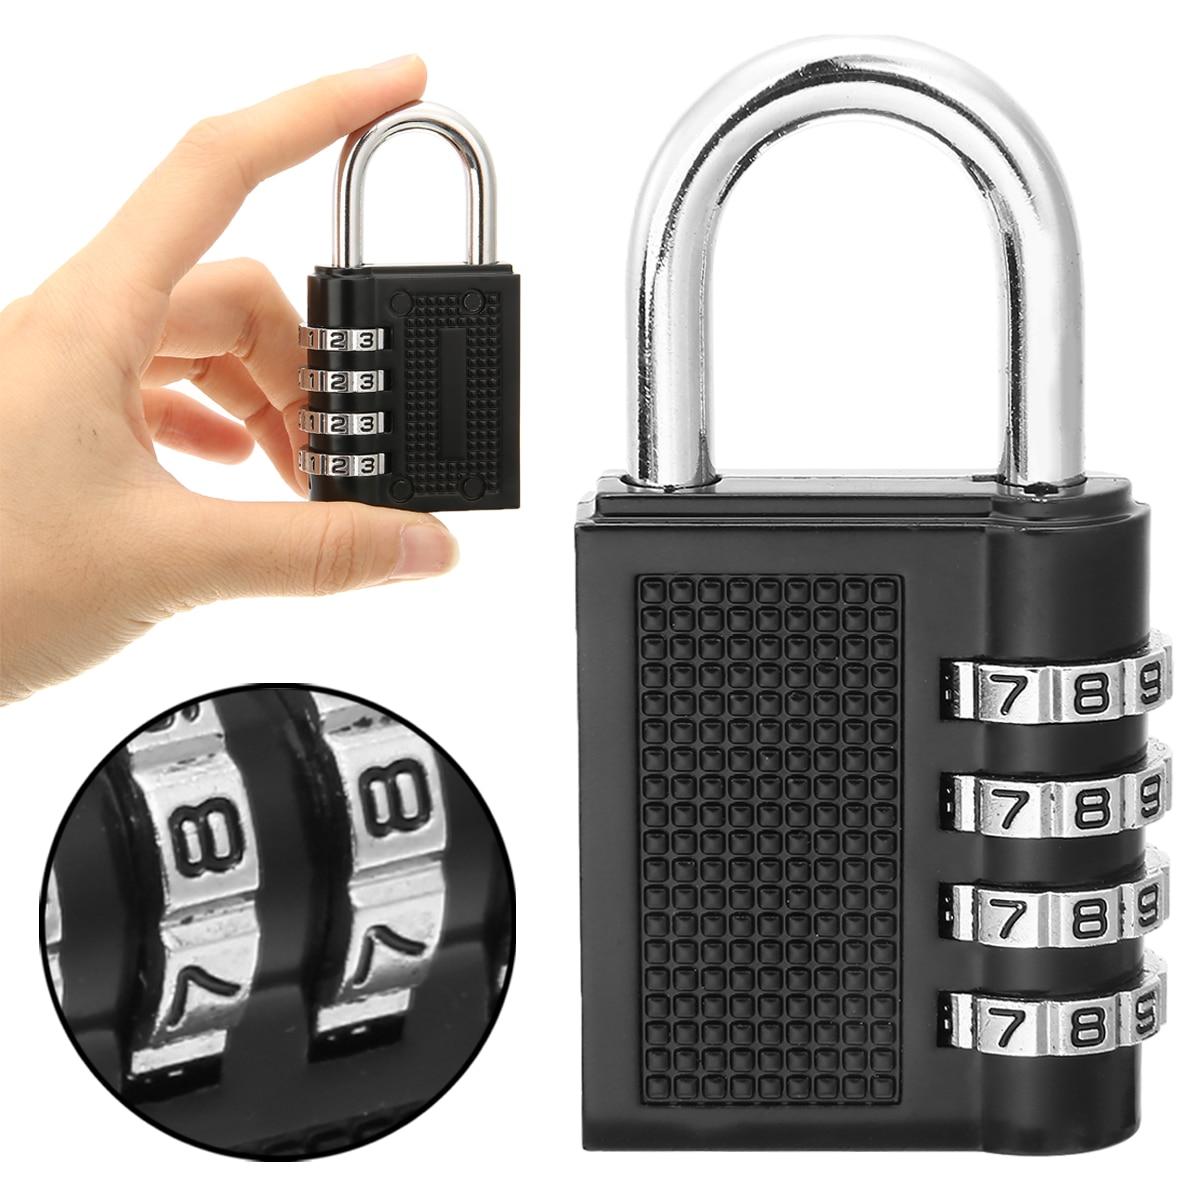 Bet365 4 digit security number